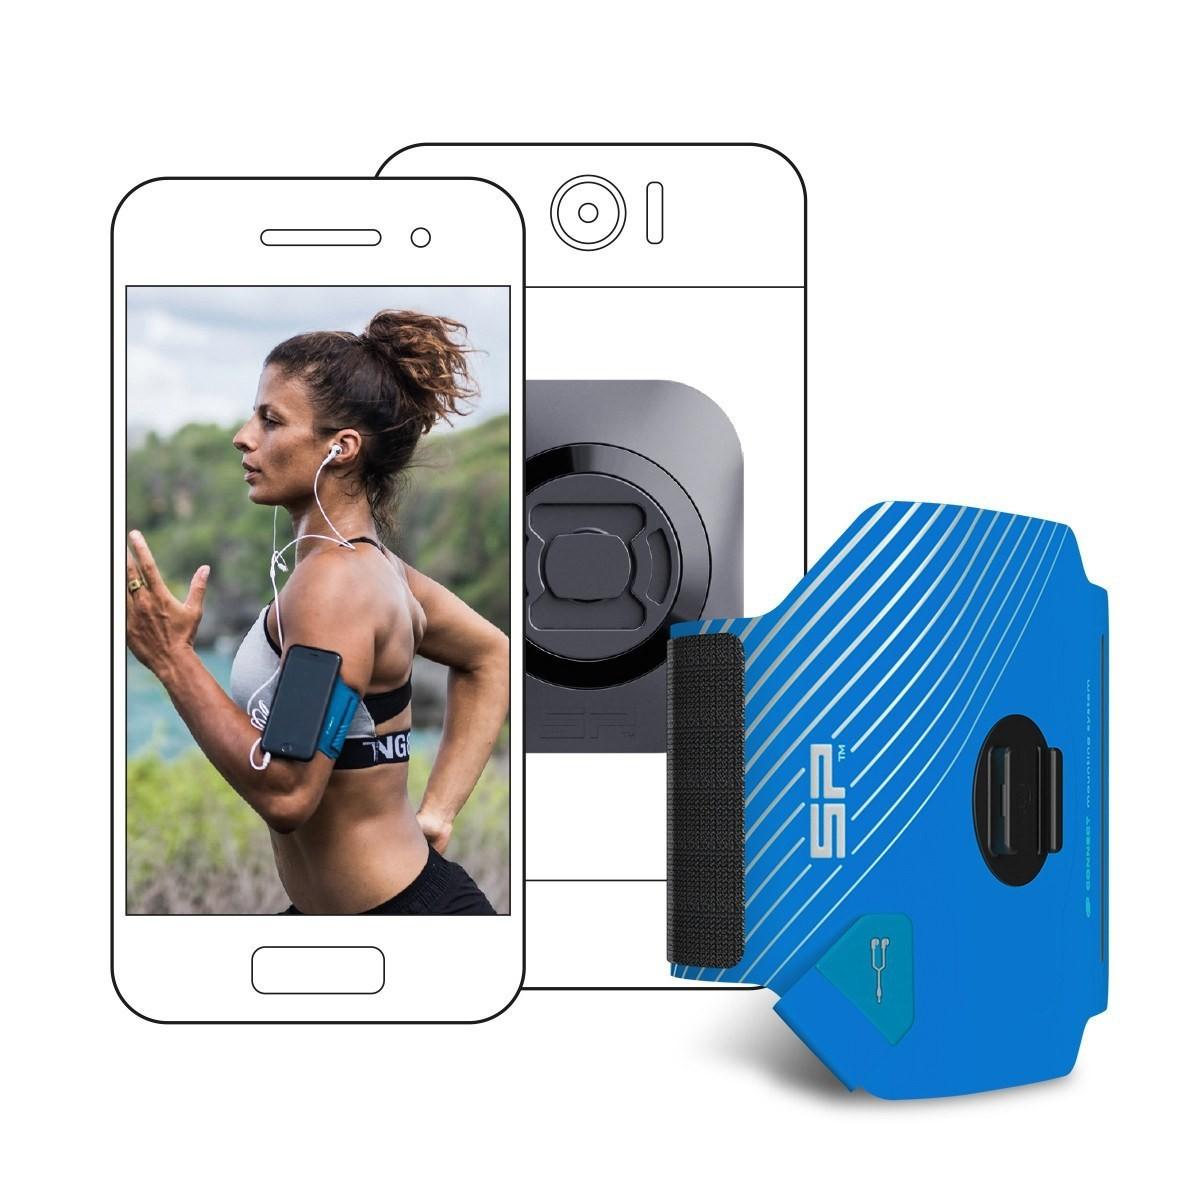 Tālrunis turētāji Fitness Bundle SP Connect